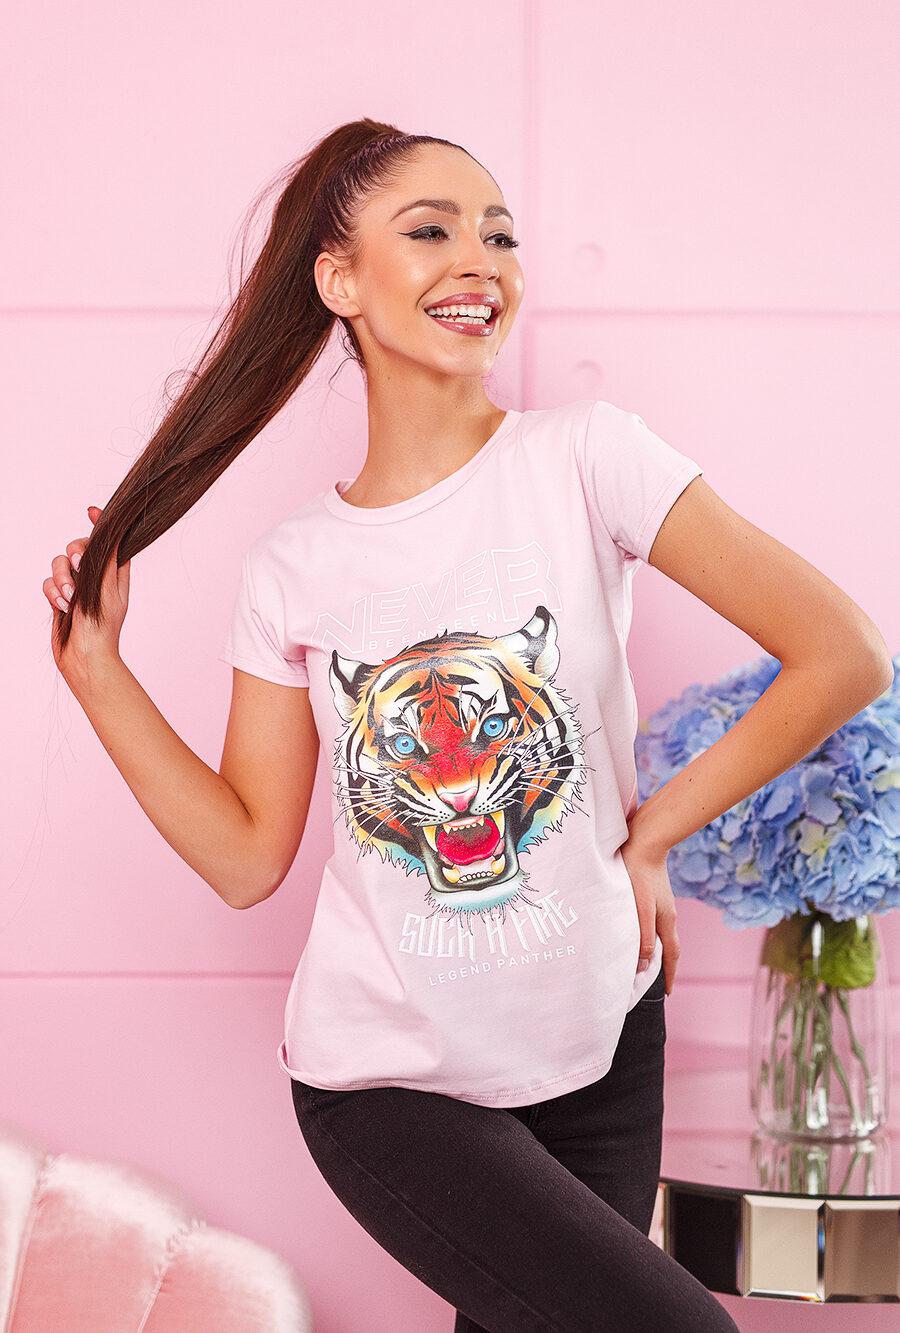 tshirt koszulka na krotki rekaw damska z nadrukiem tygrys jasny roz (1)